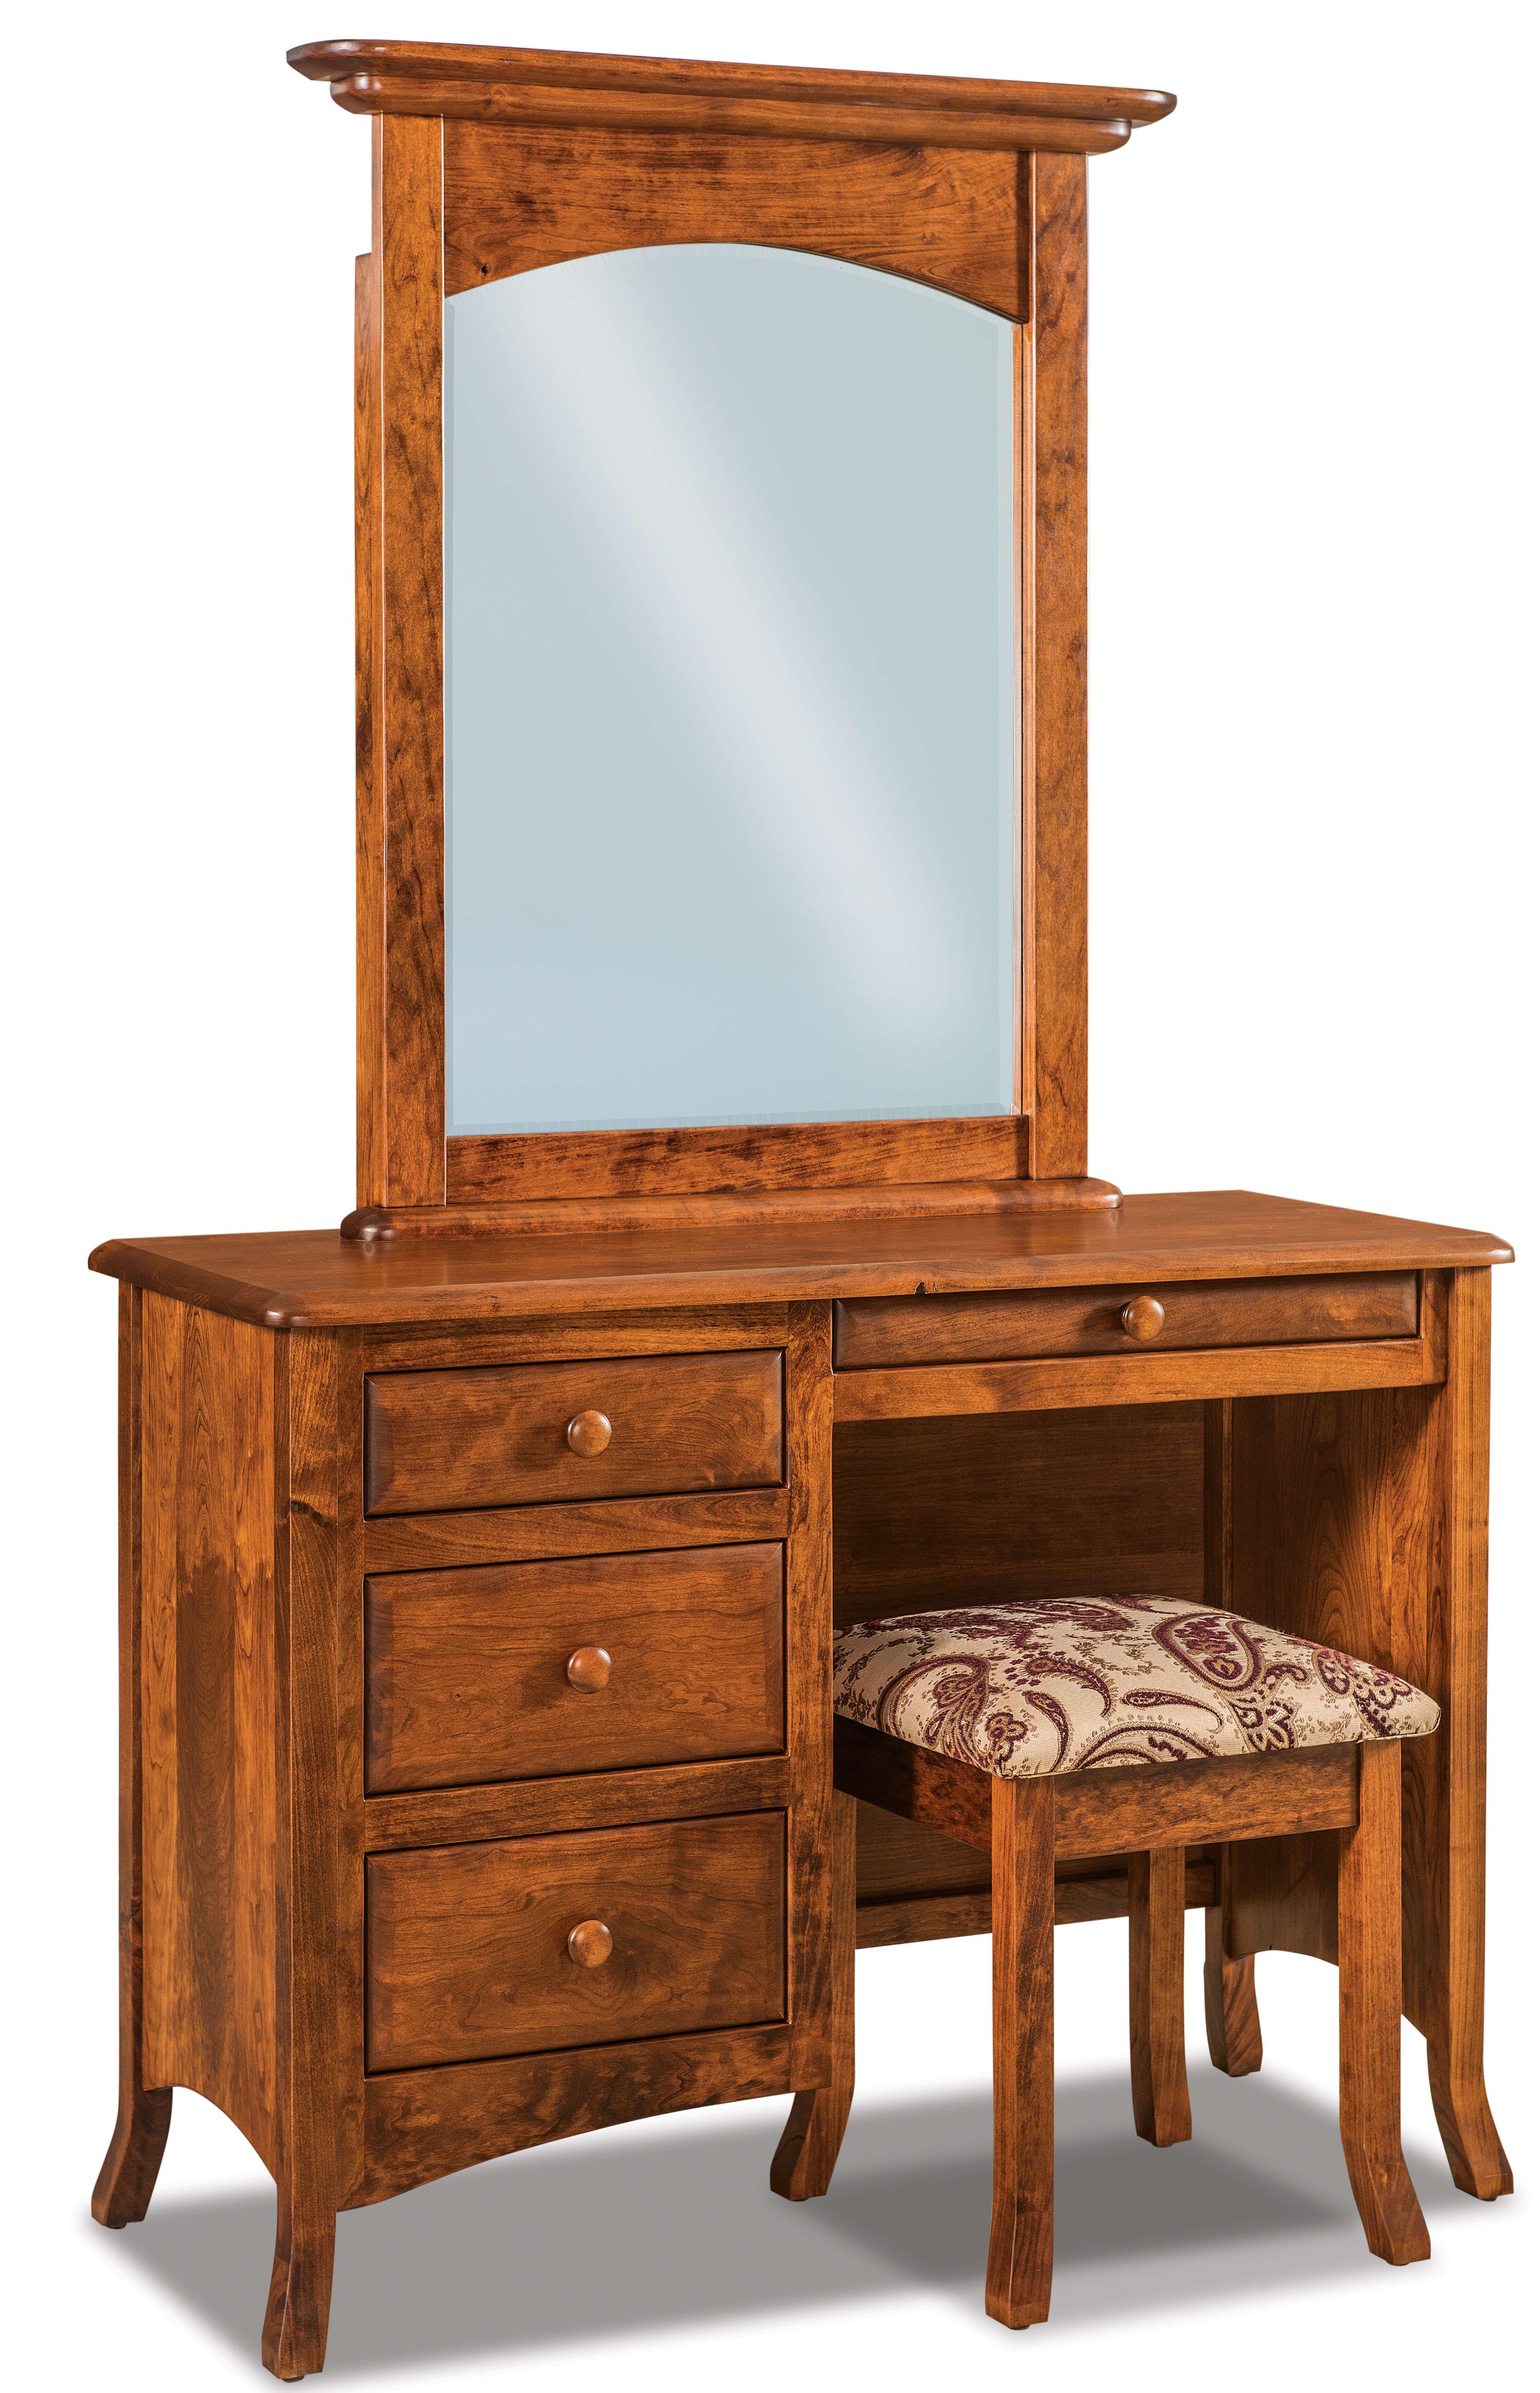 Bradley Mirrored Vanity